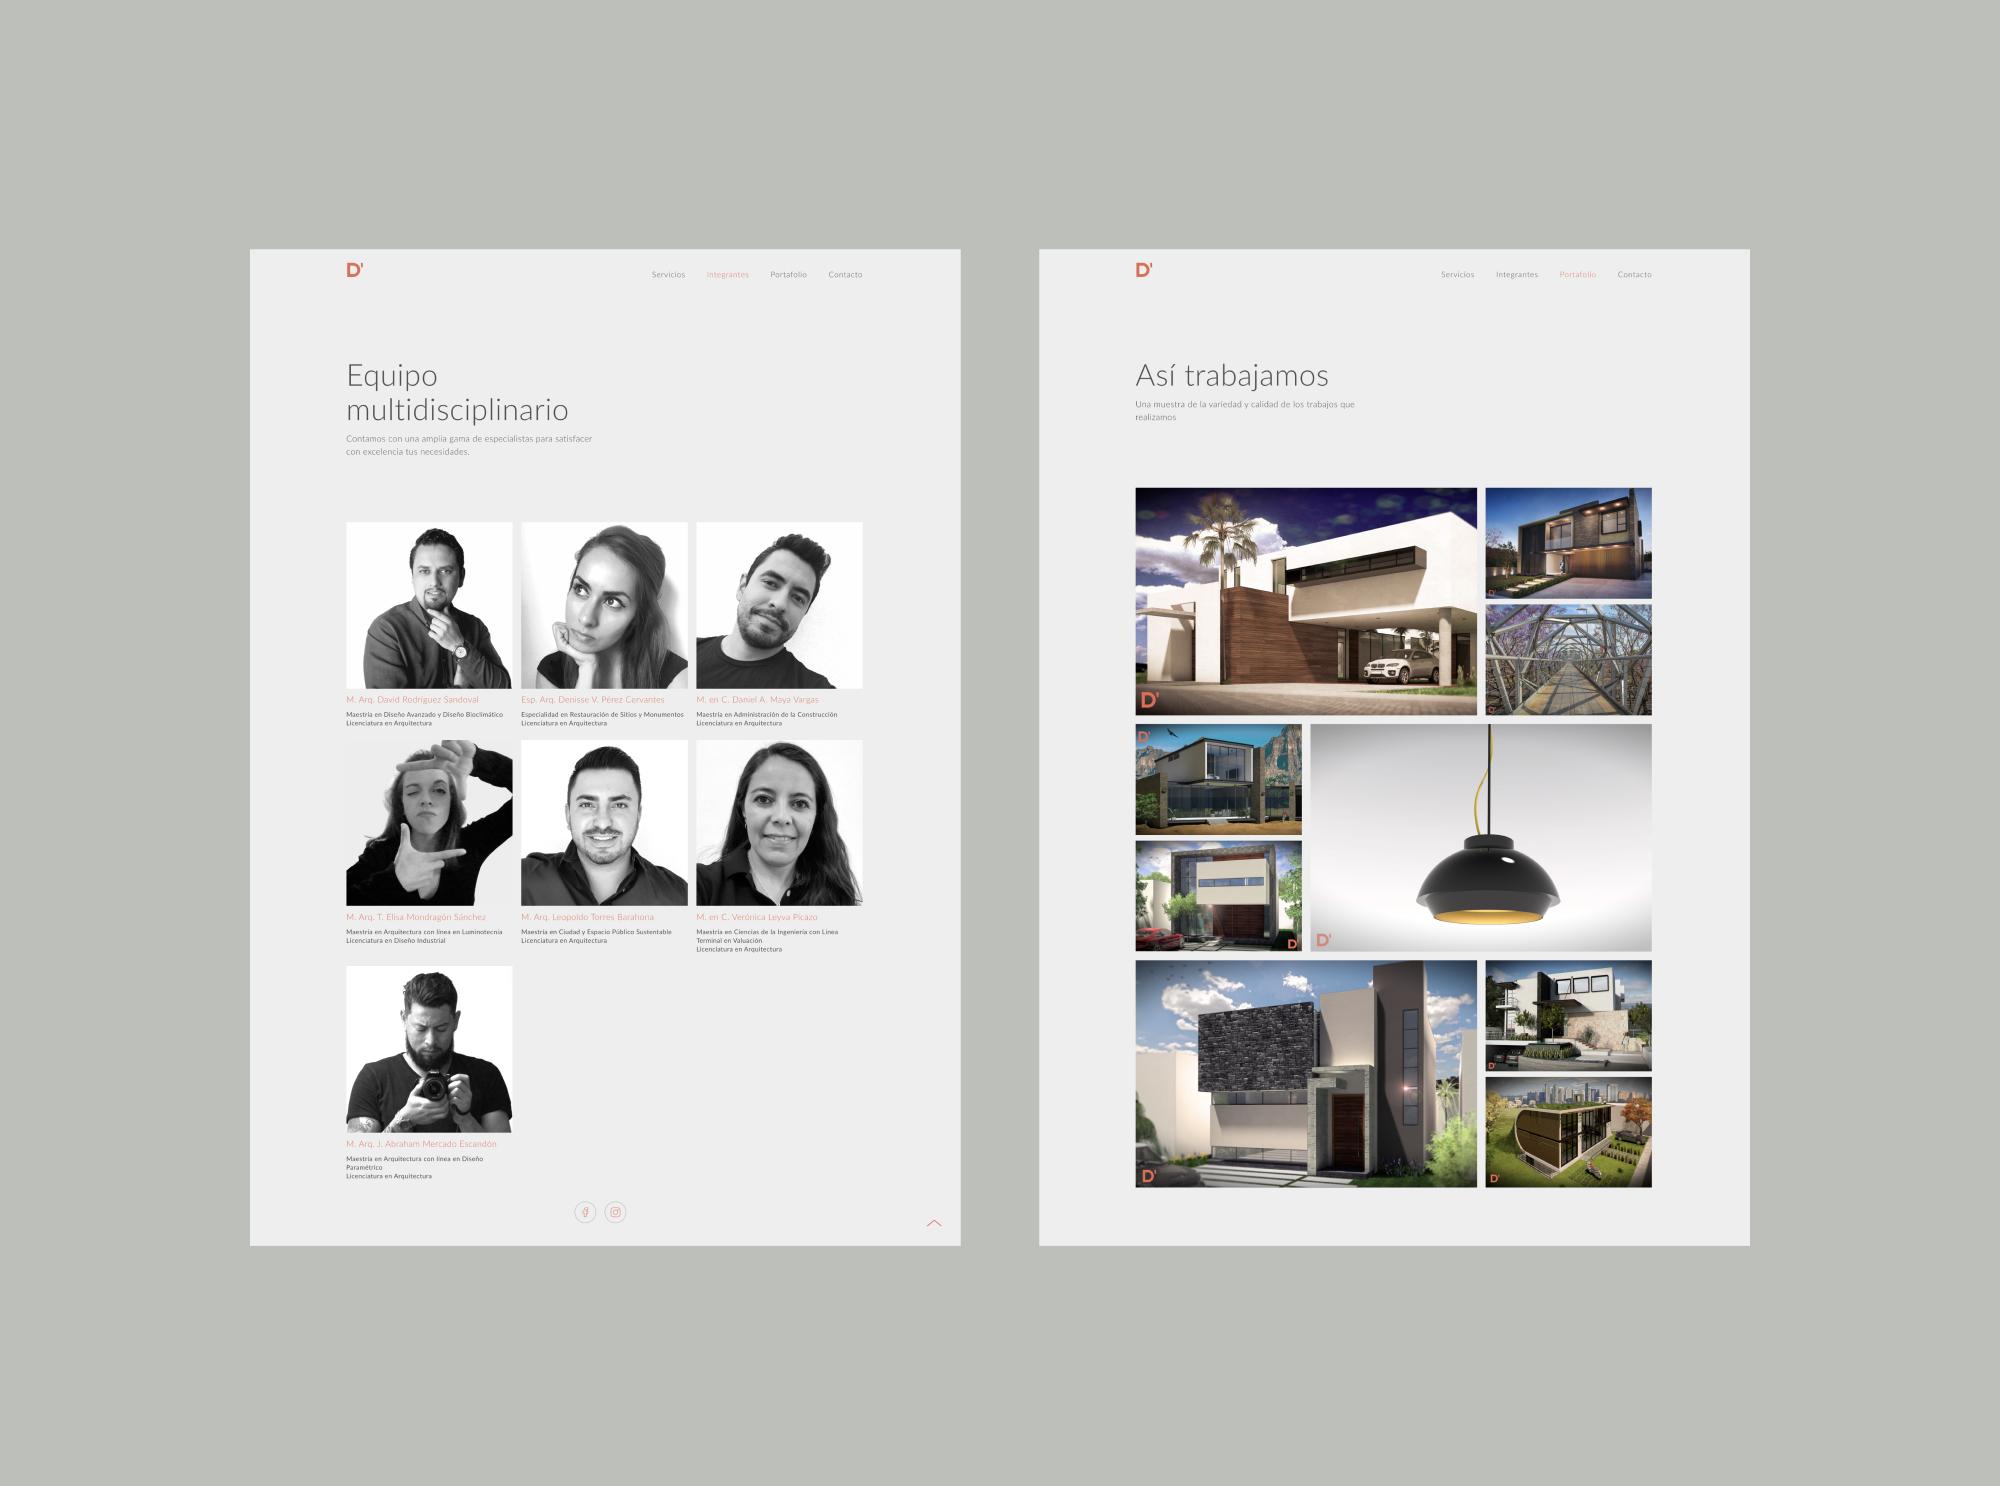 Ddiseño team and portfolio pages